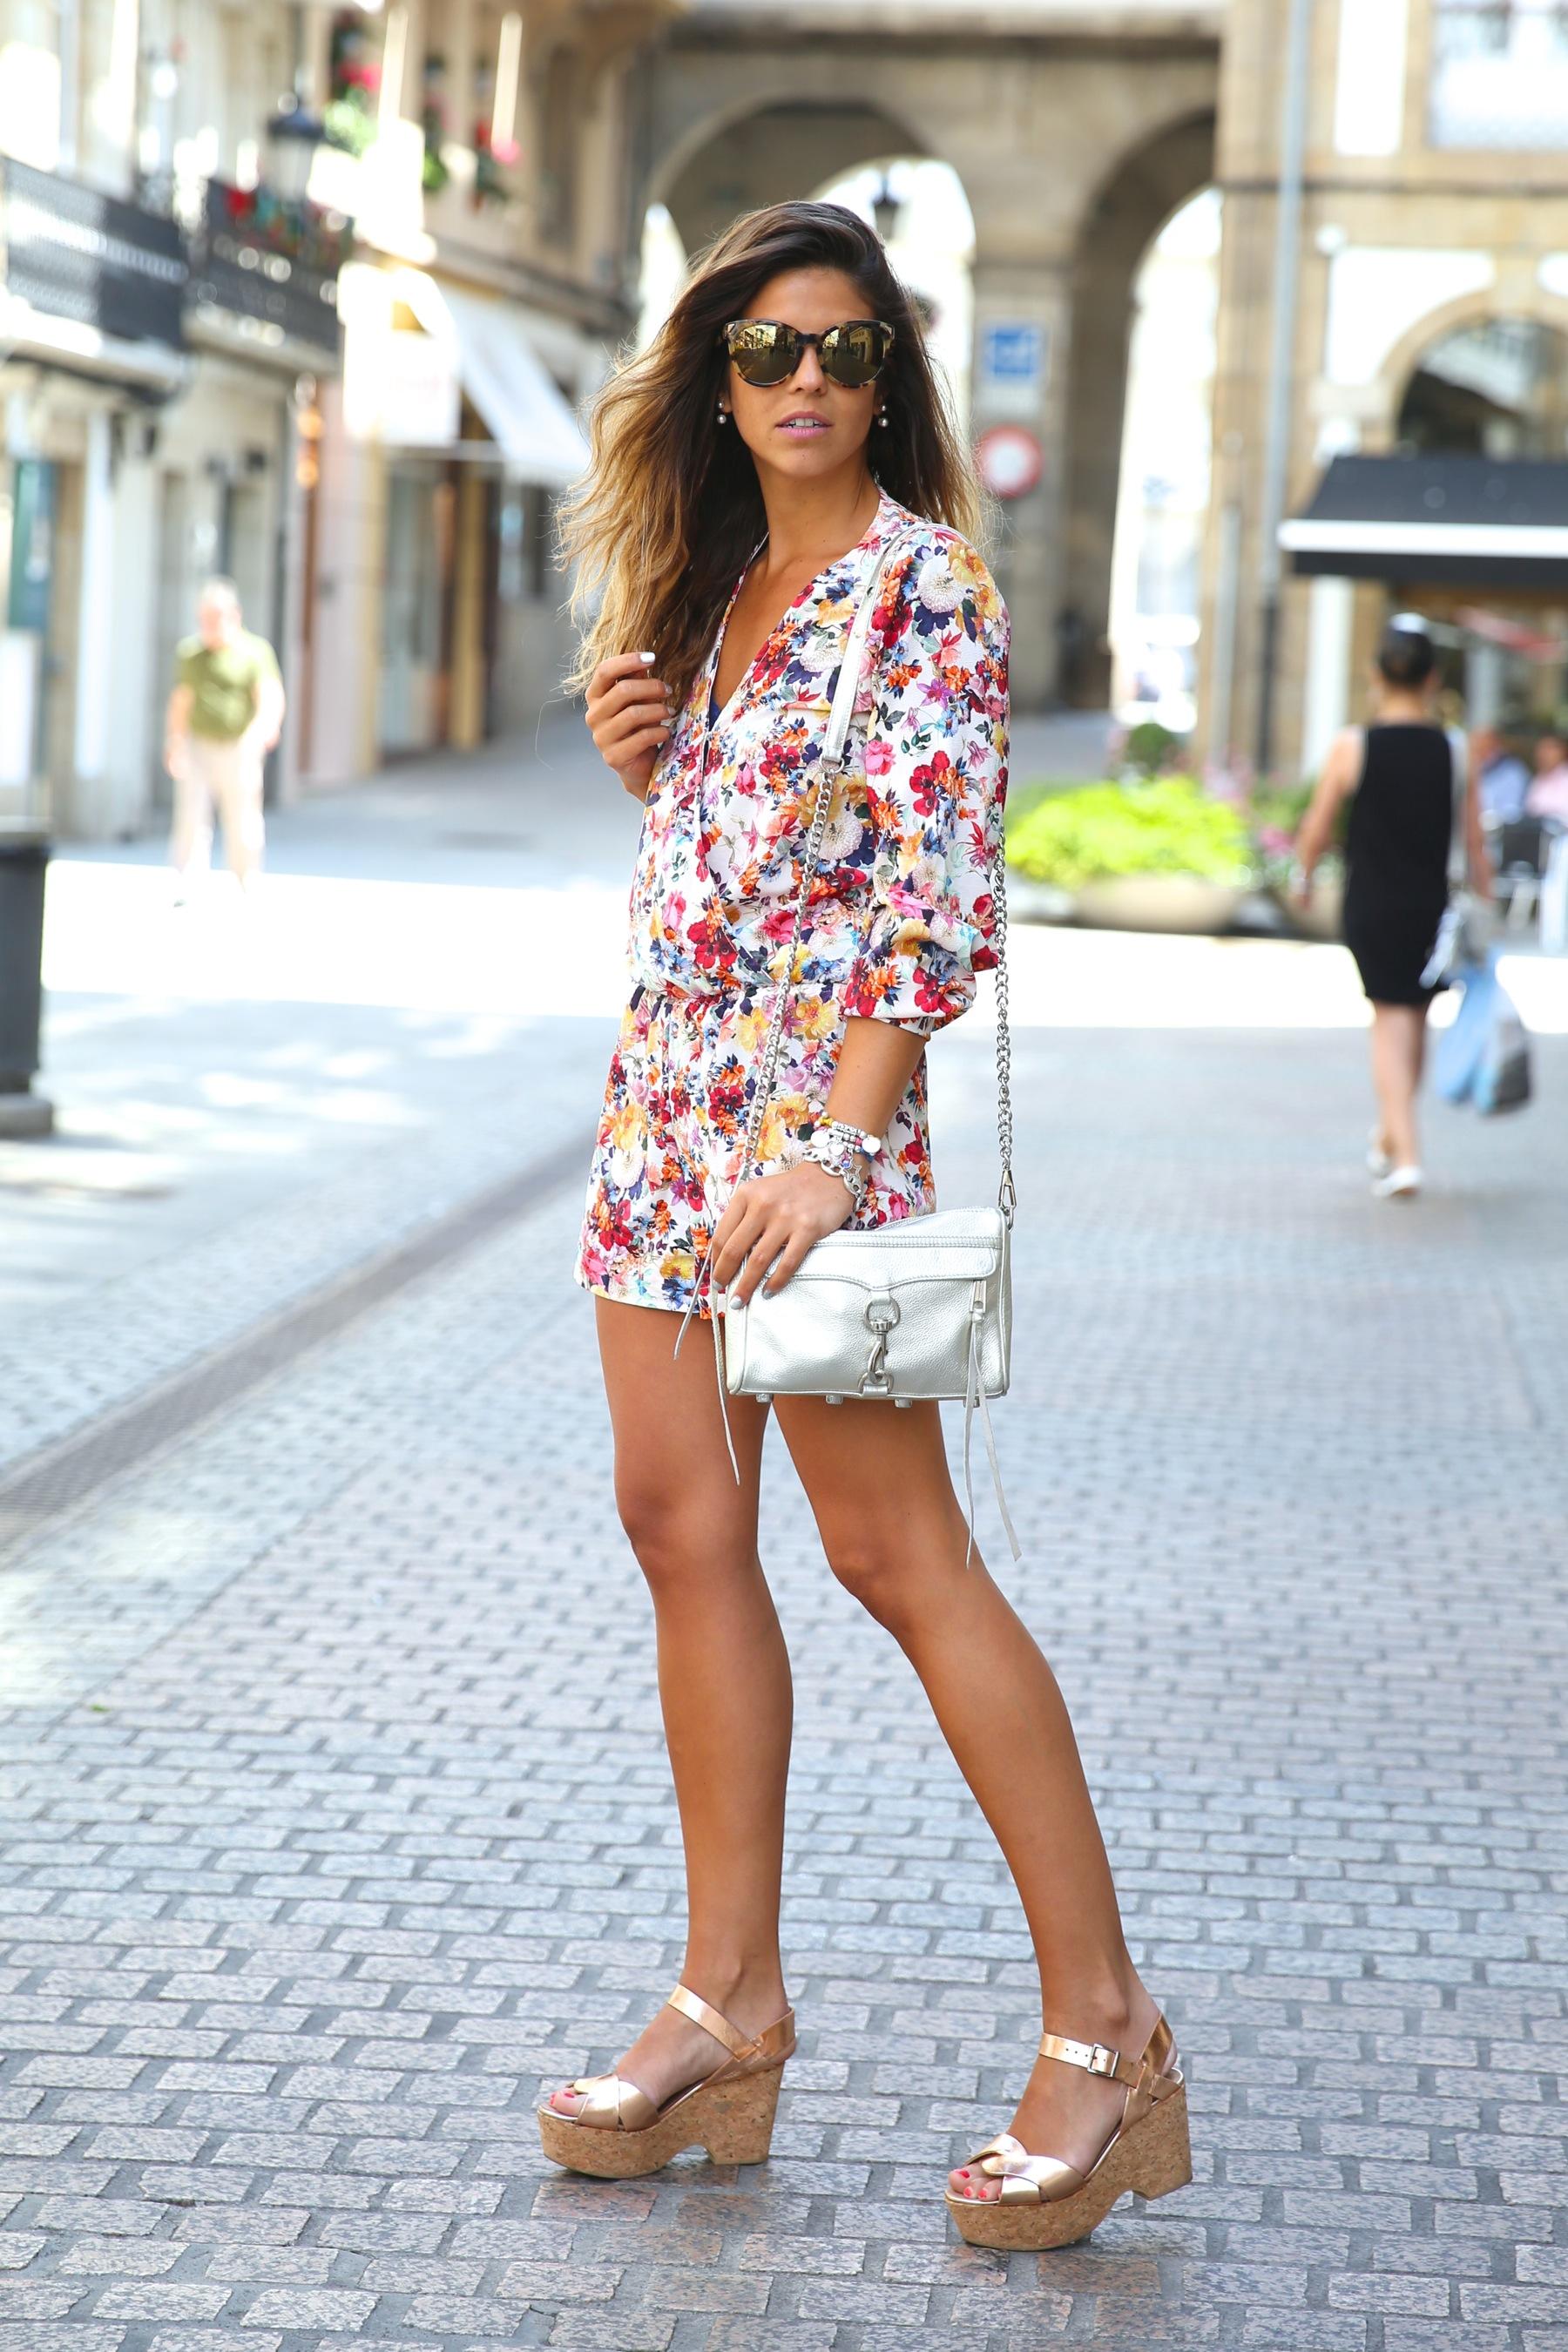 trendy_taste-look-outfit-street_style-ootd-blog-blogger-fashion_spain-moda_españa-mono-flores-flower_print-verano-summer-overall-la_coruña-6